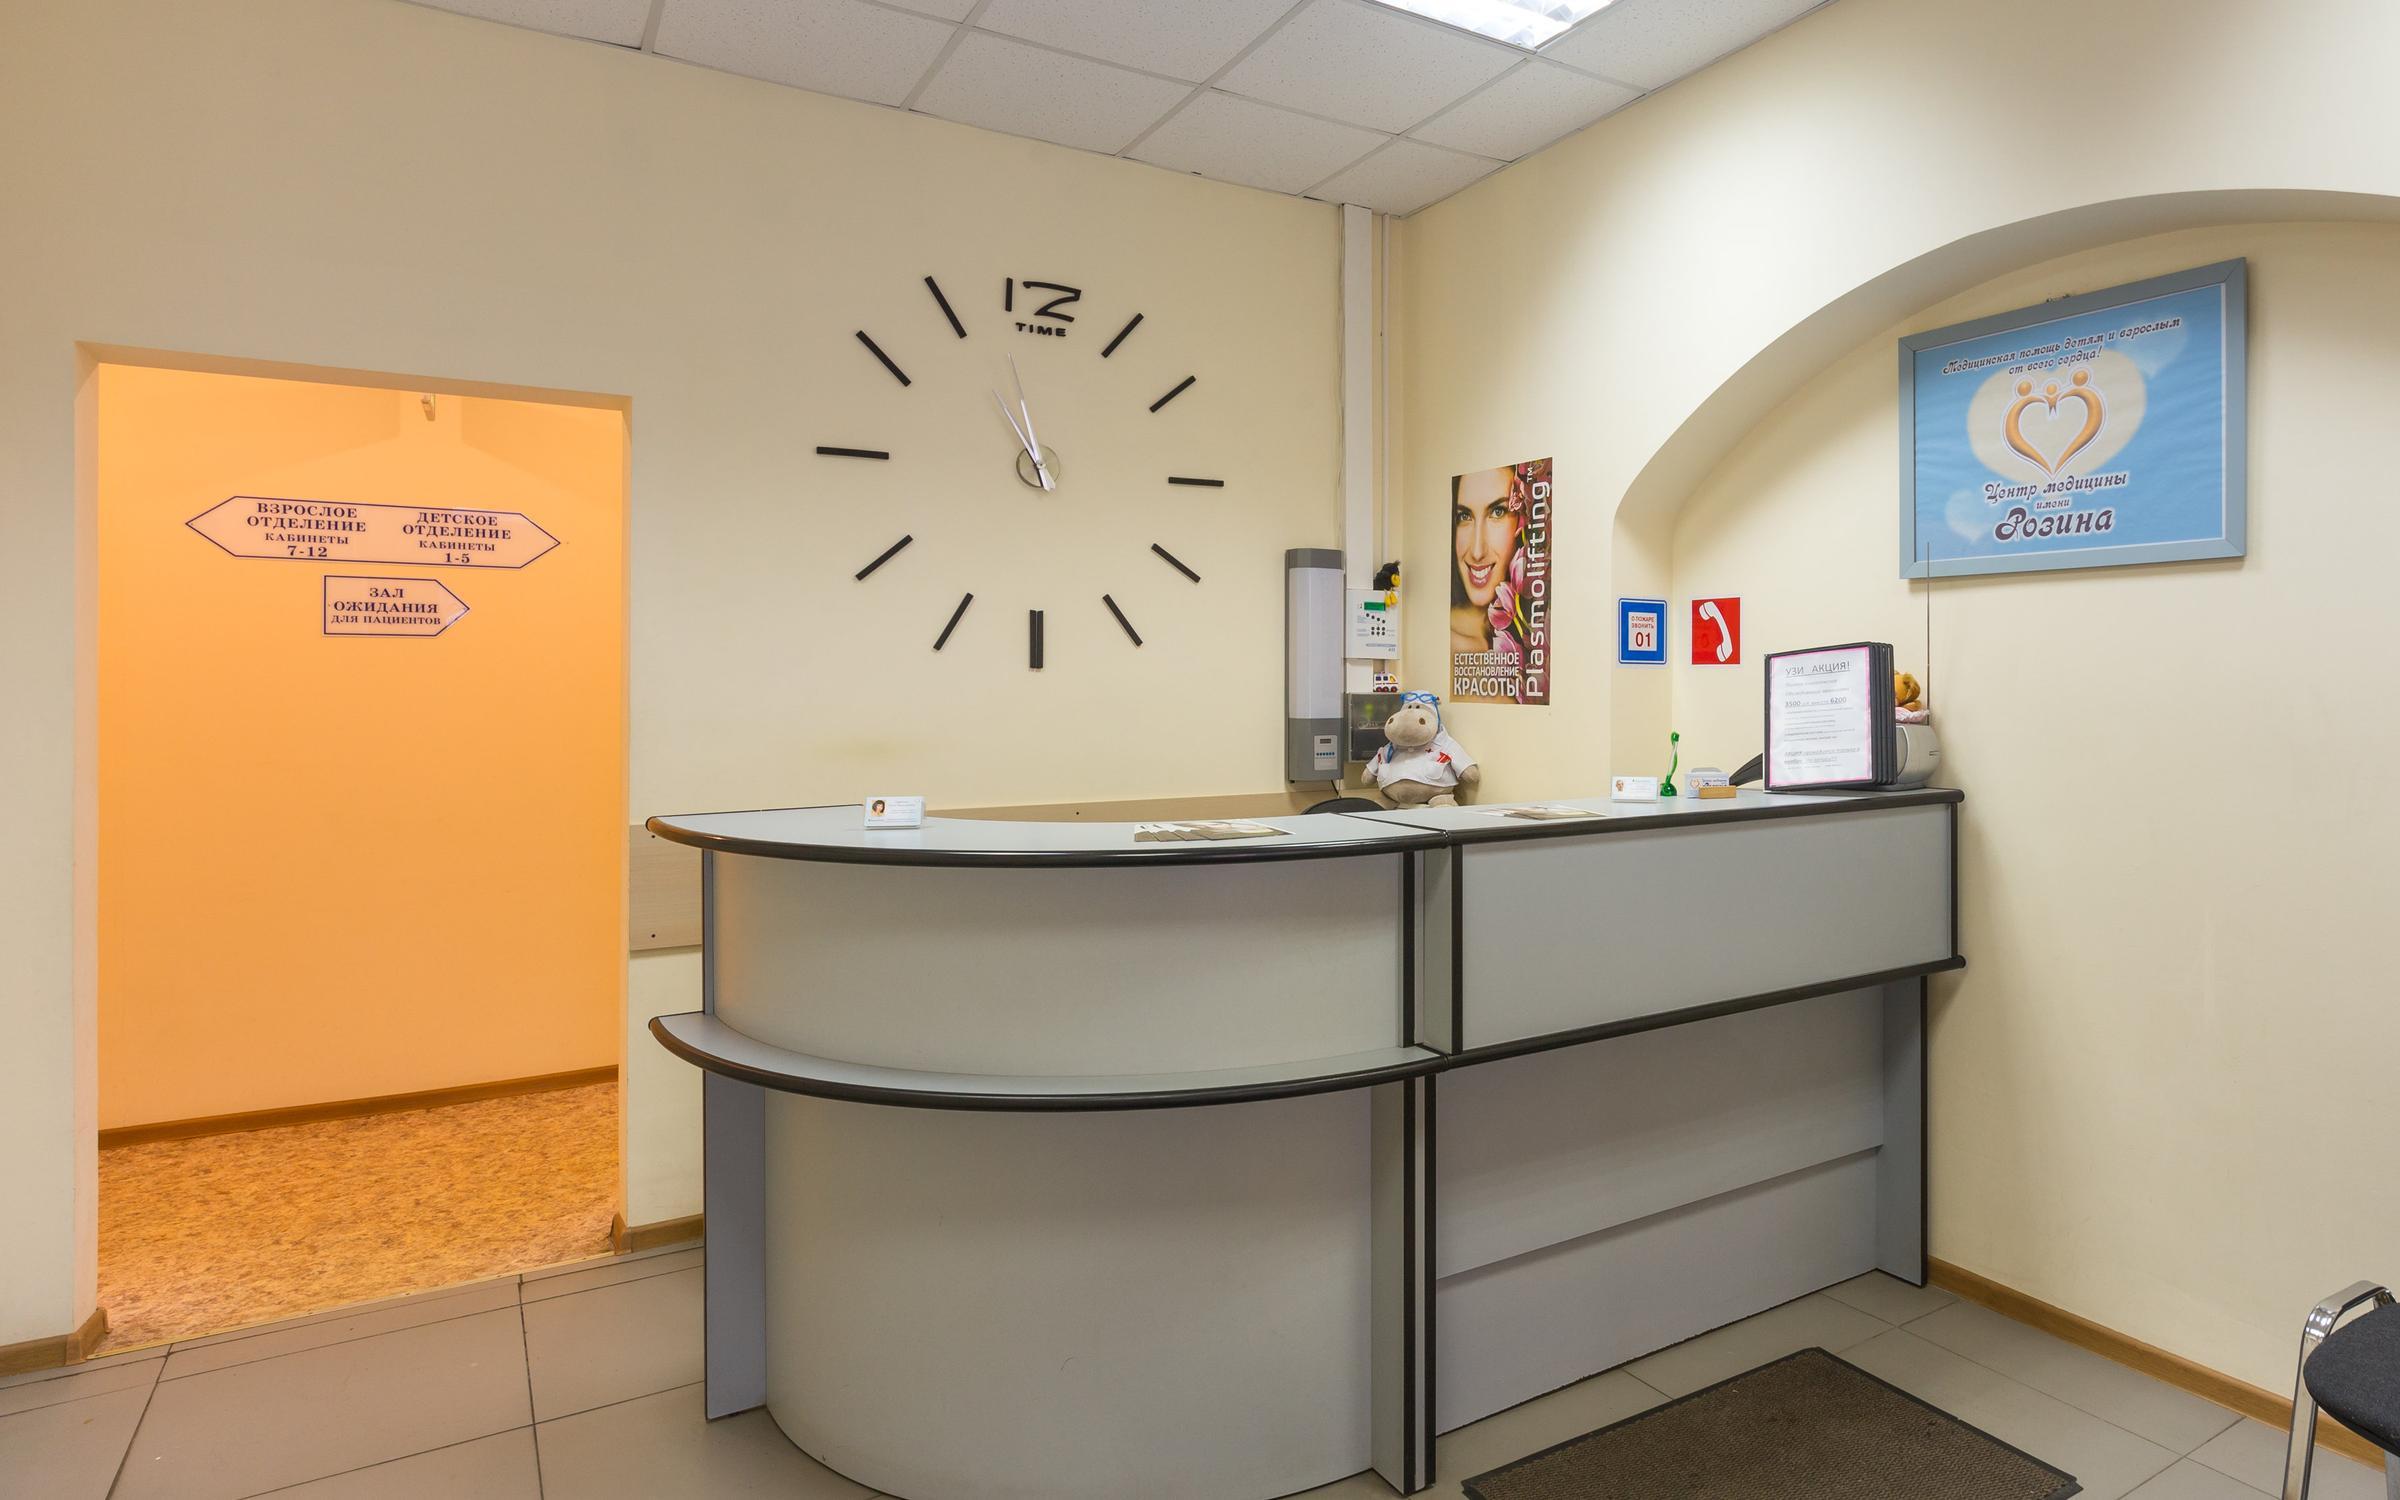 фотография Центра медицины имени Розина в Митино